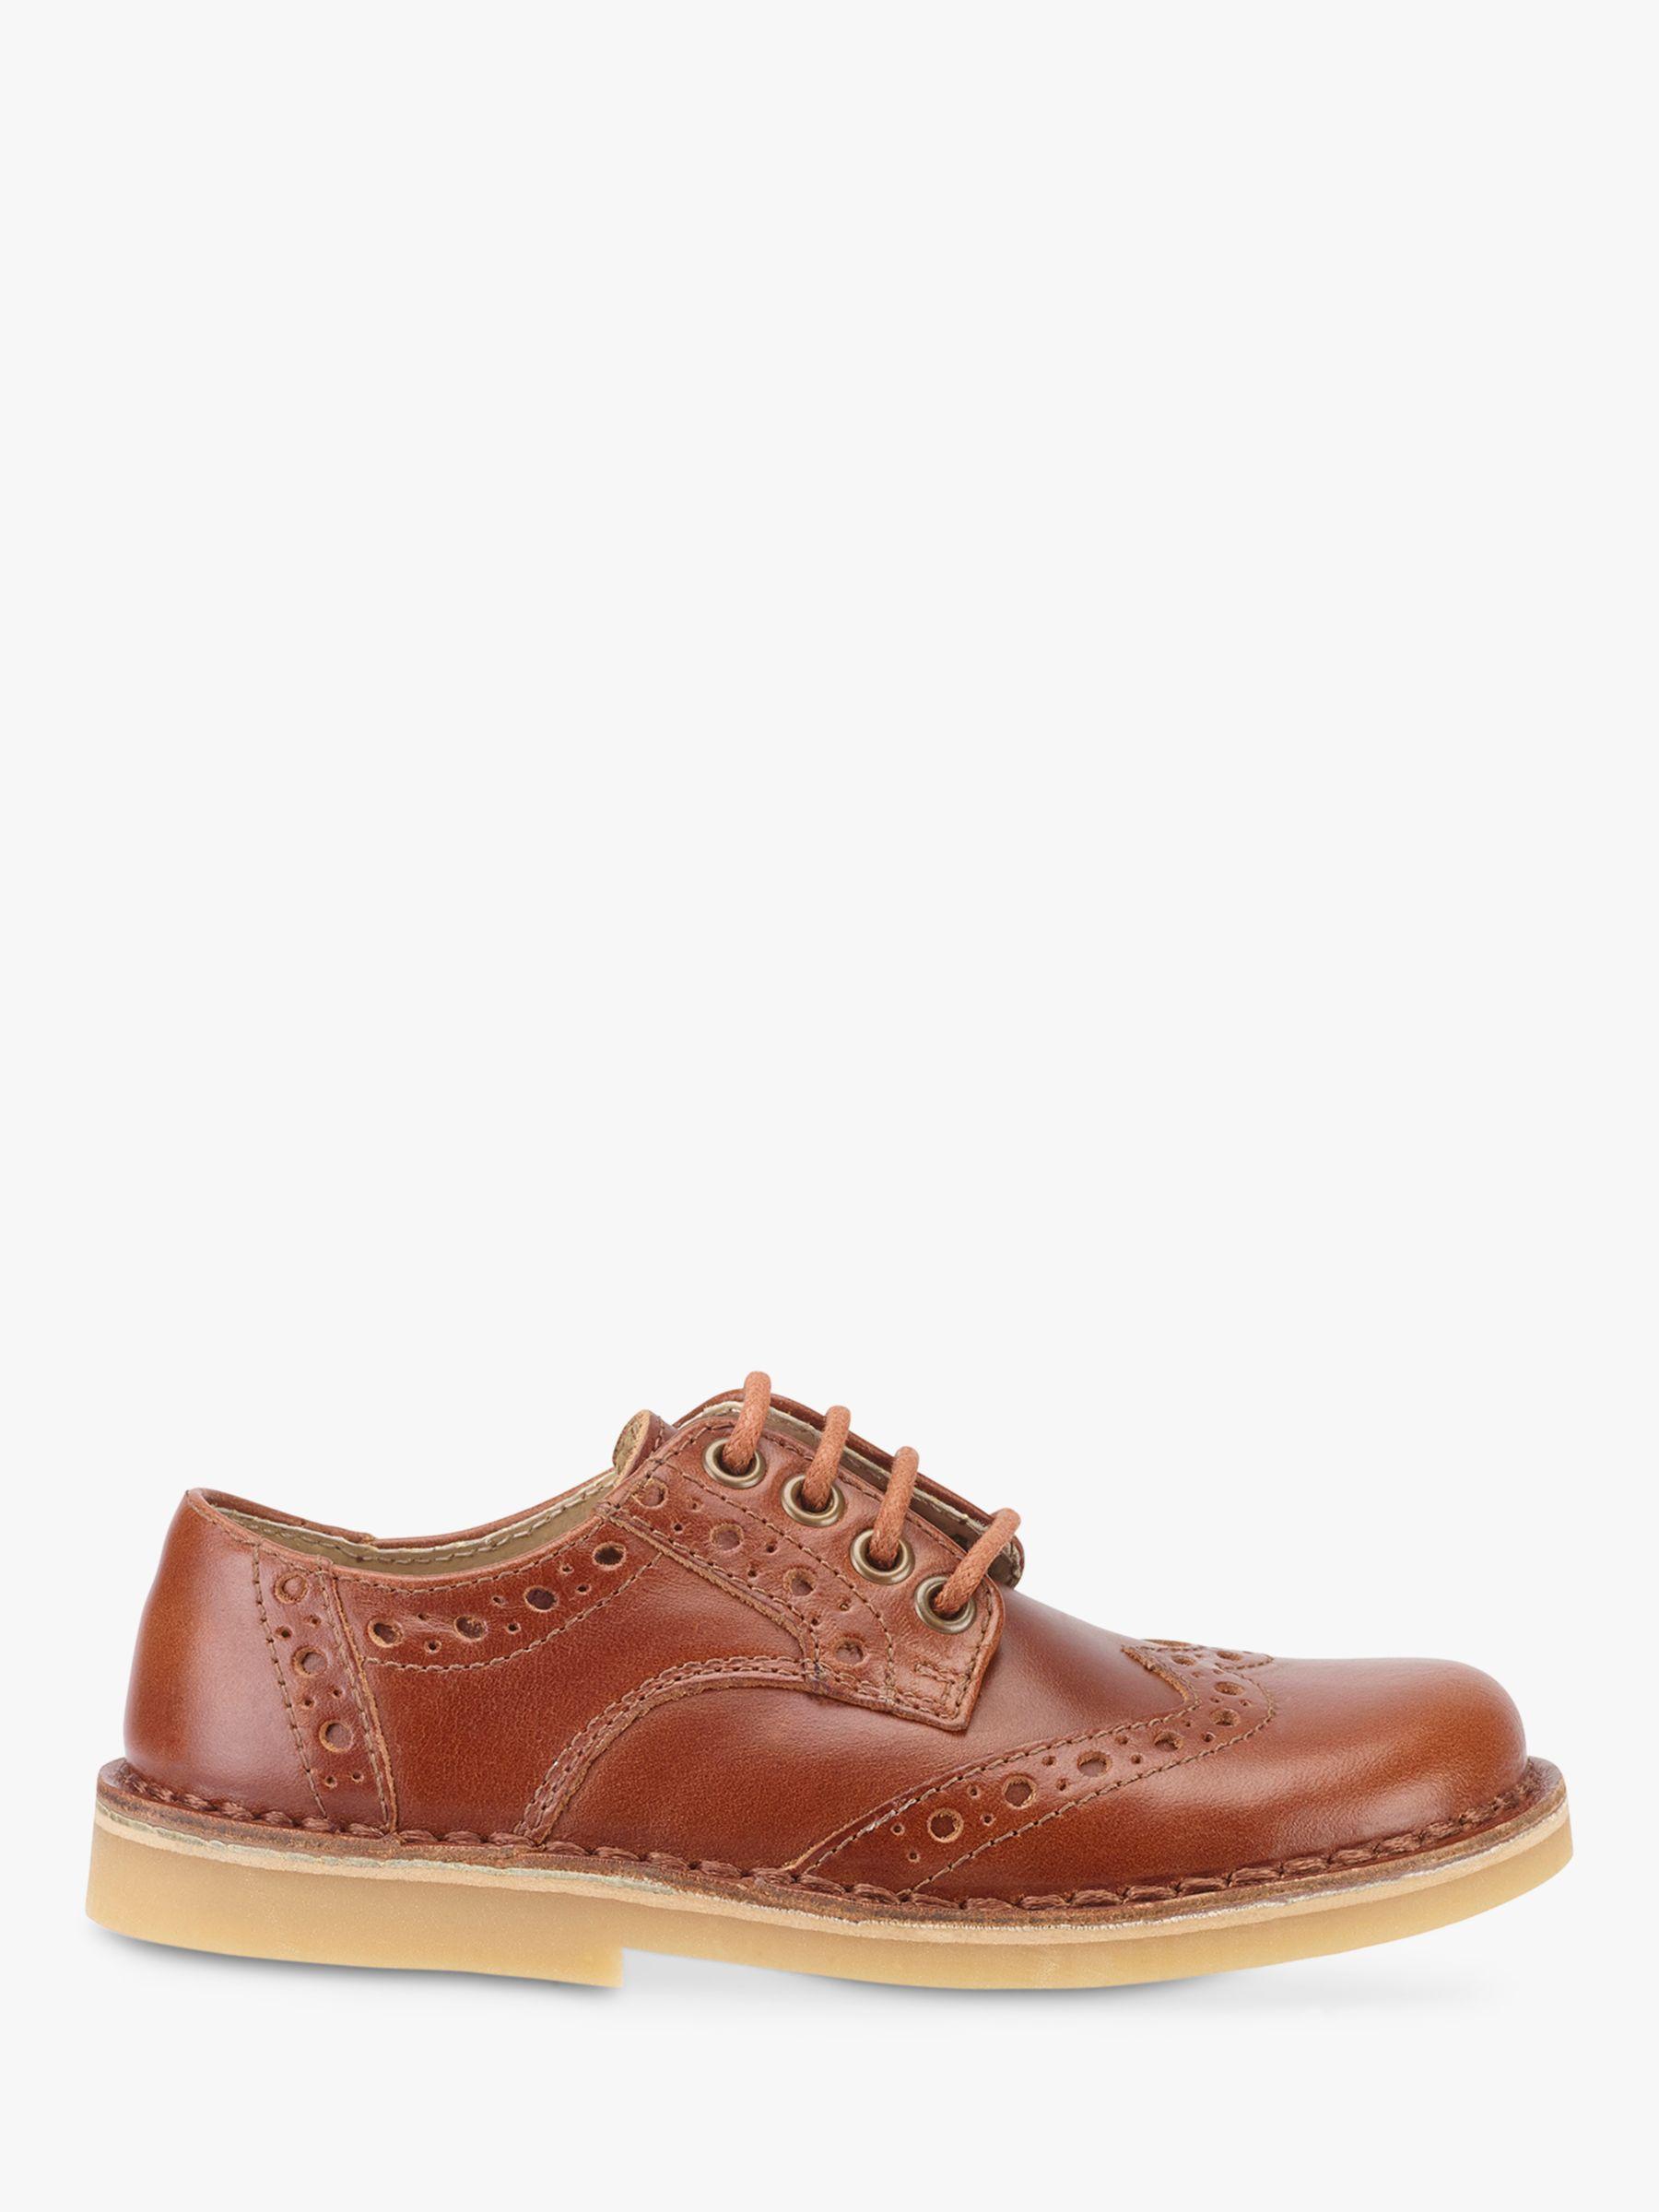 Start-Rite Start-rite Children's Tiptoe Brogue Shoes, Tan